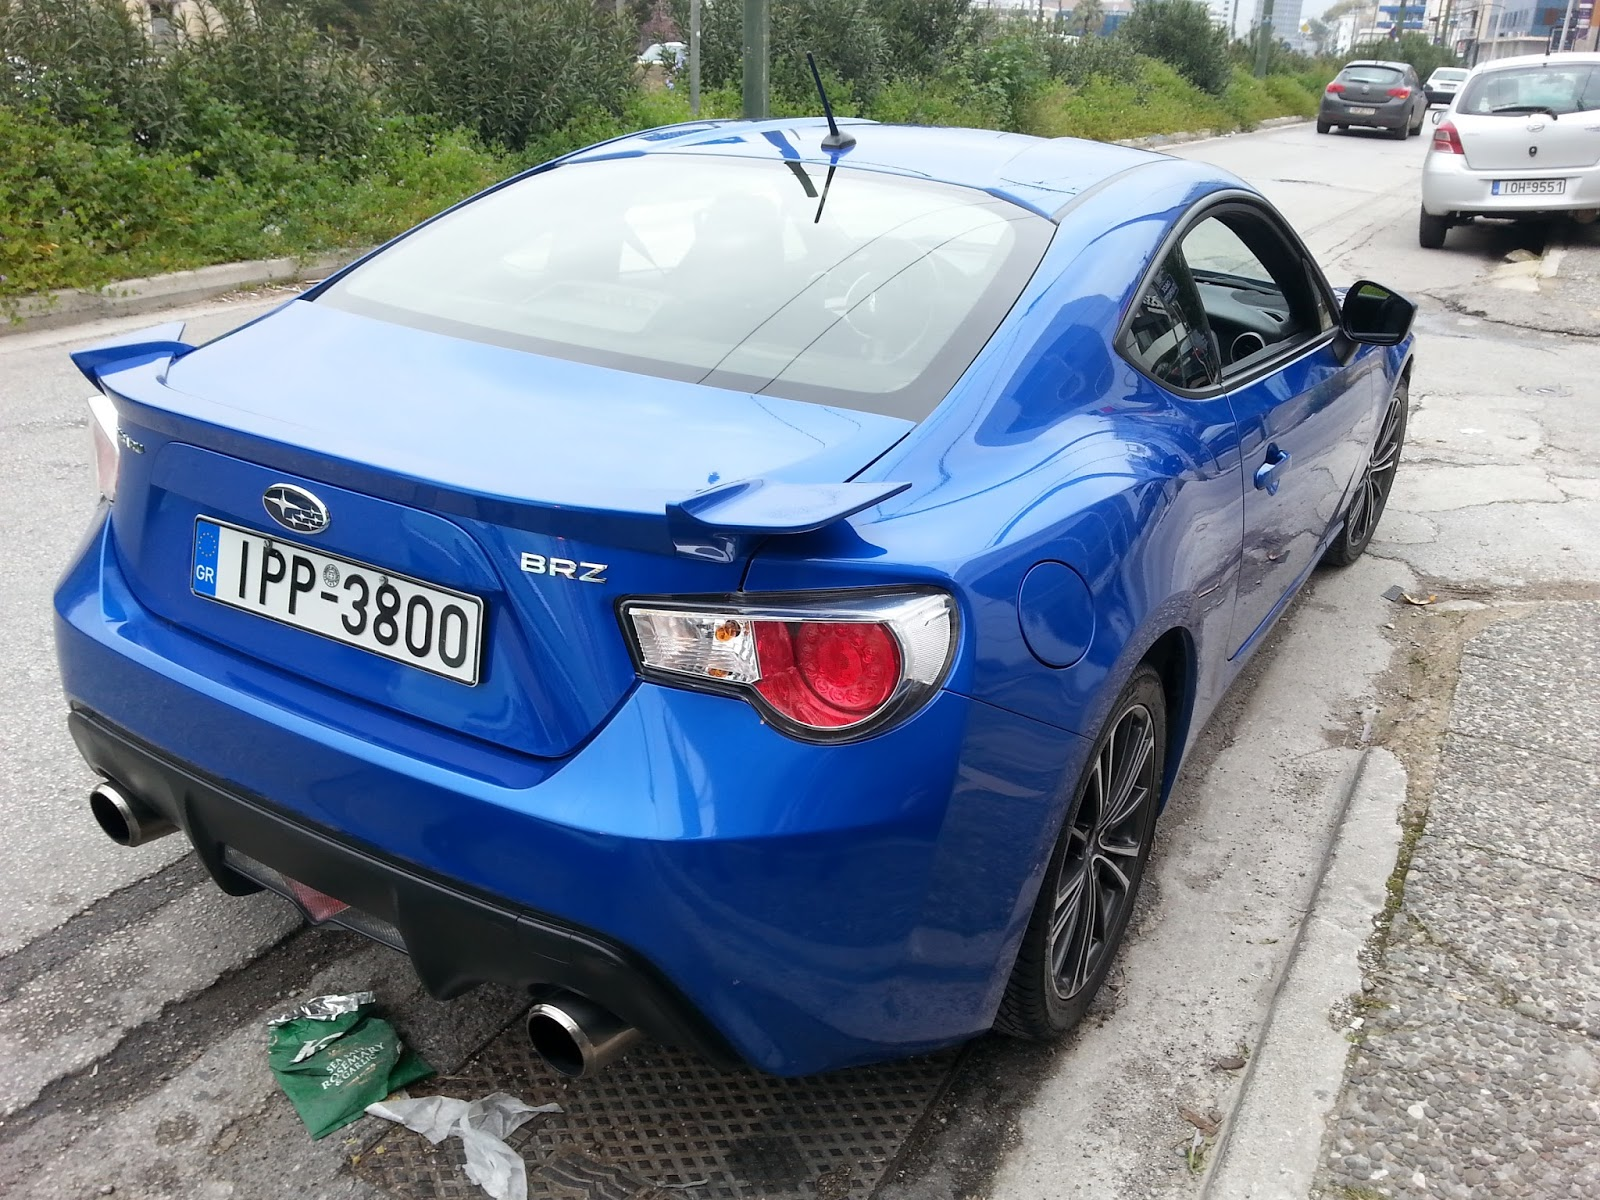 F5 2 Οδηγούμε (με τις πάντες) το Subaru BRZ drift, Subaru, Subaru BRZ, ΔΟΚΙΜΕΣ